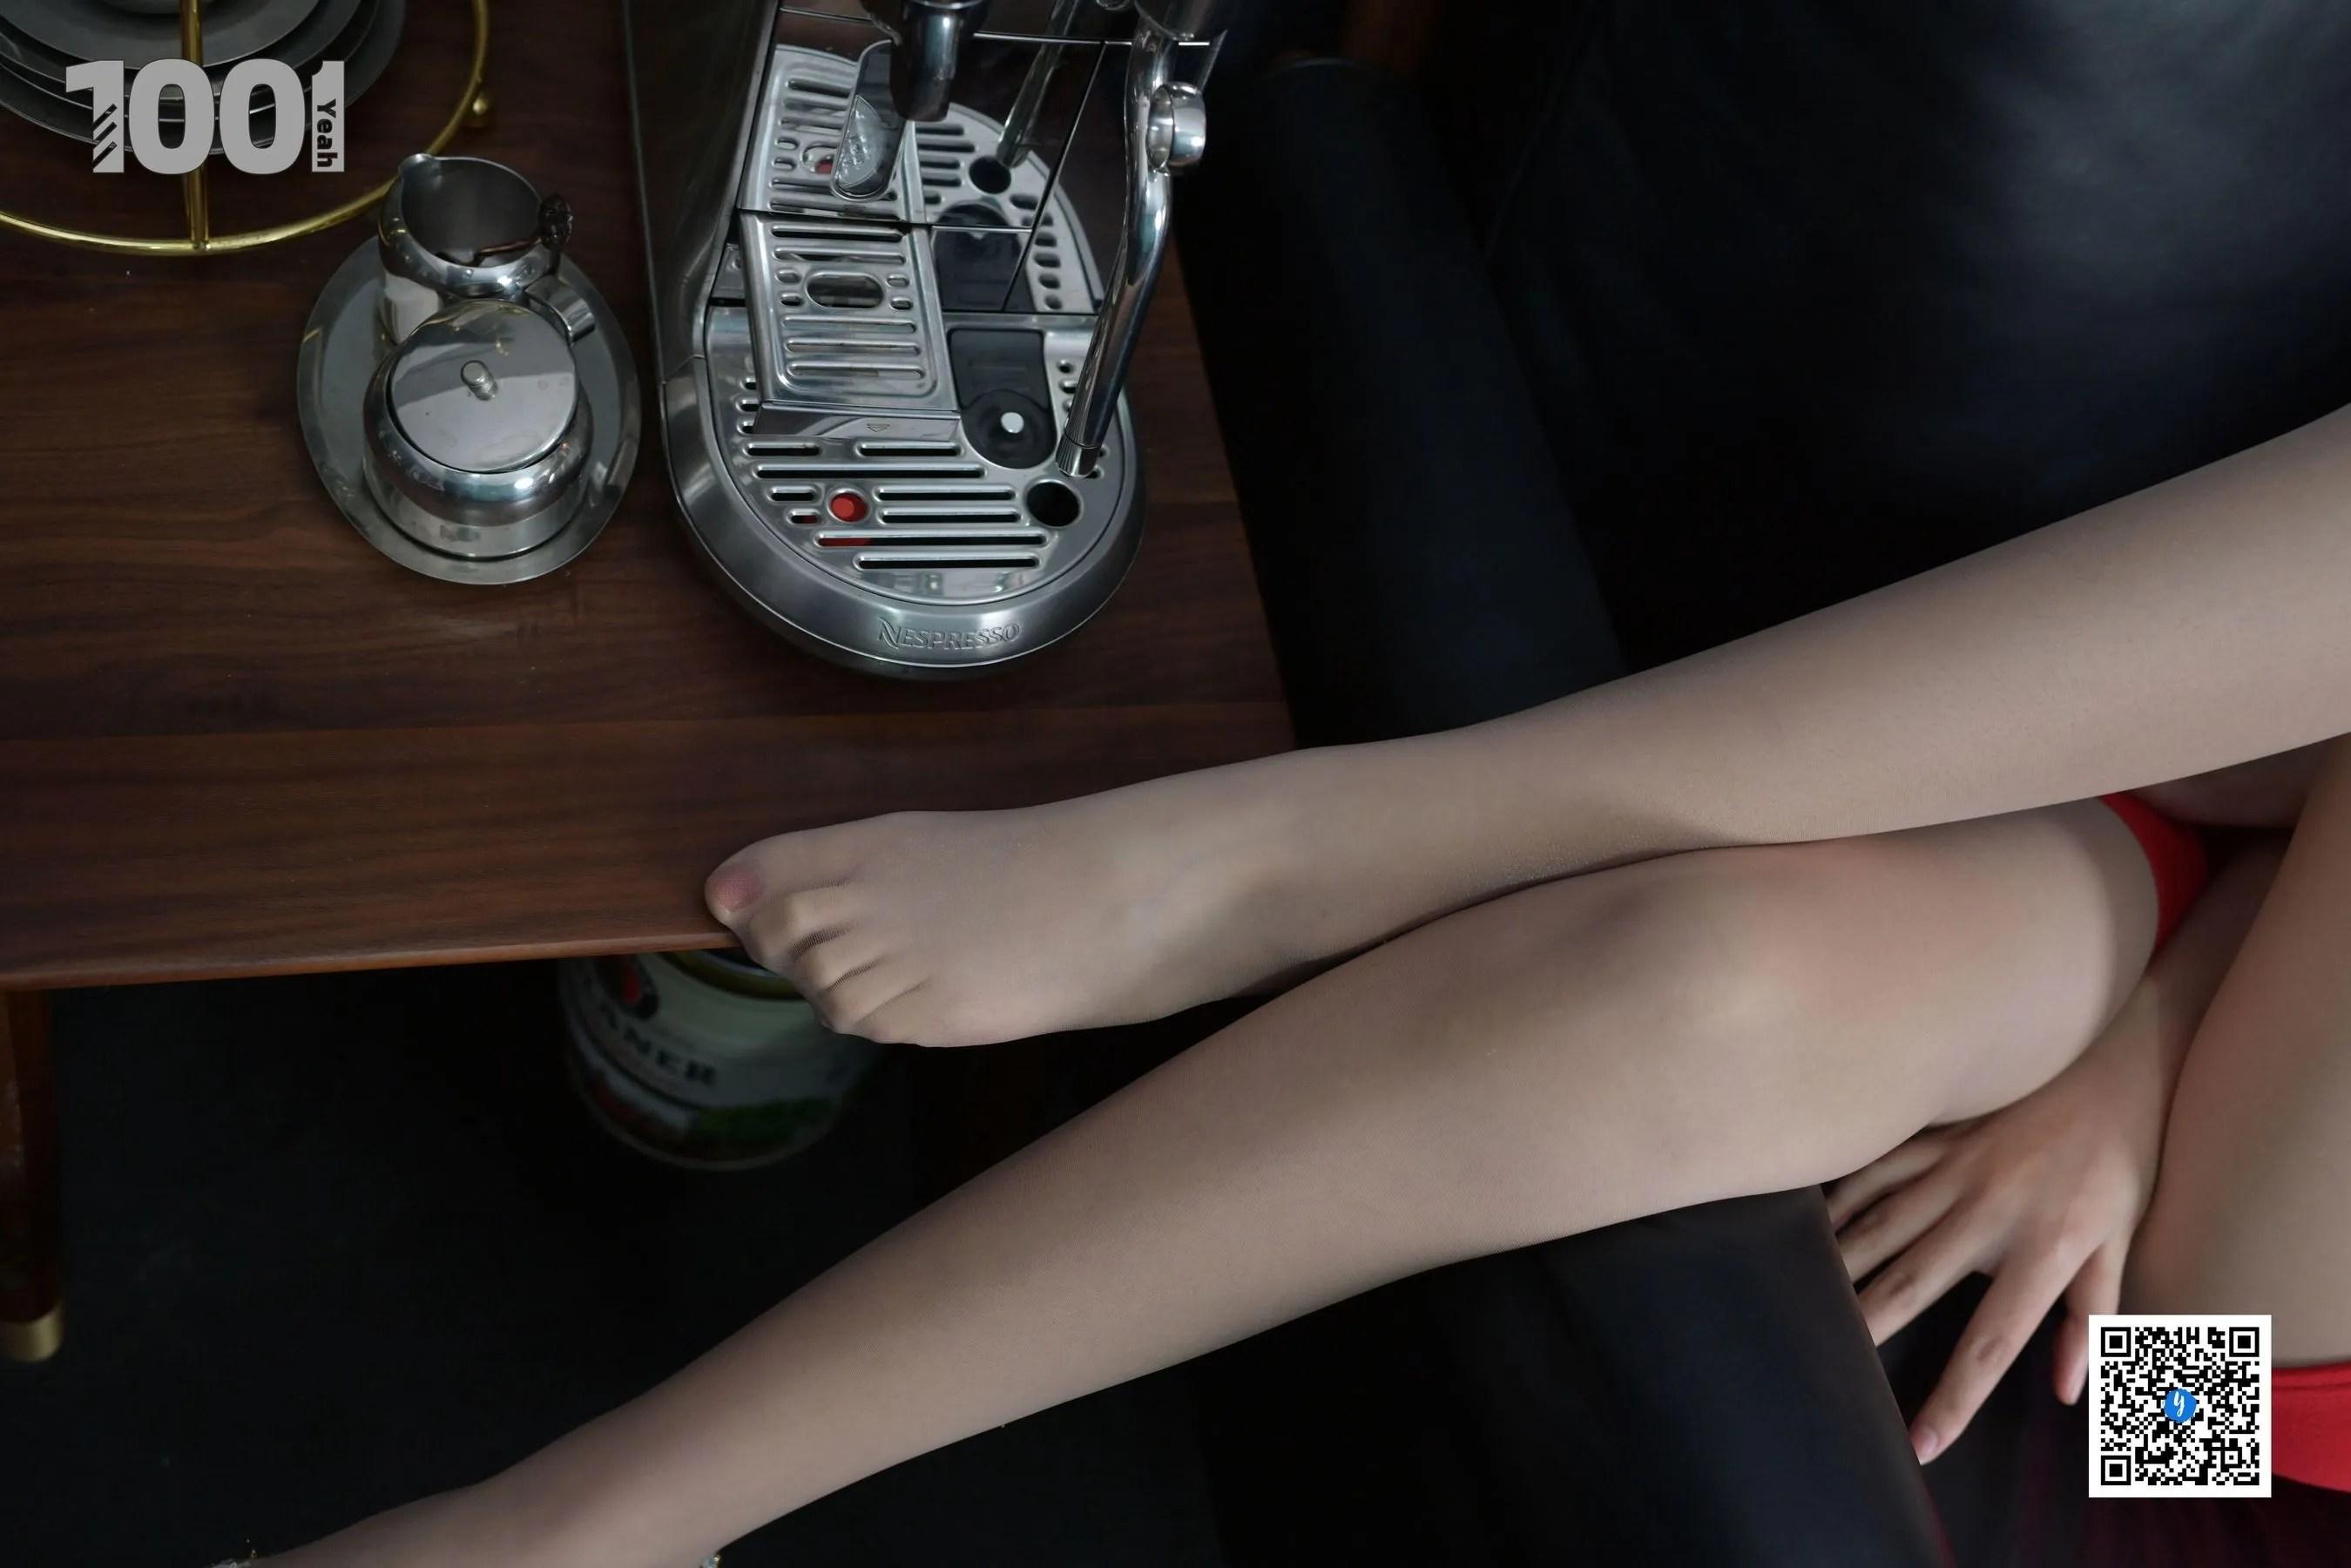 [IESS] NO.188 【一抹红2】 丝足美腿写真[90P]插图(4)